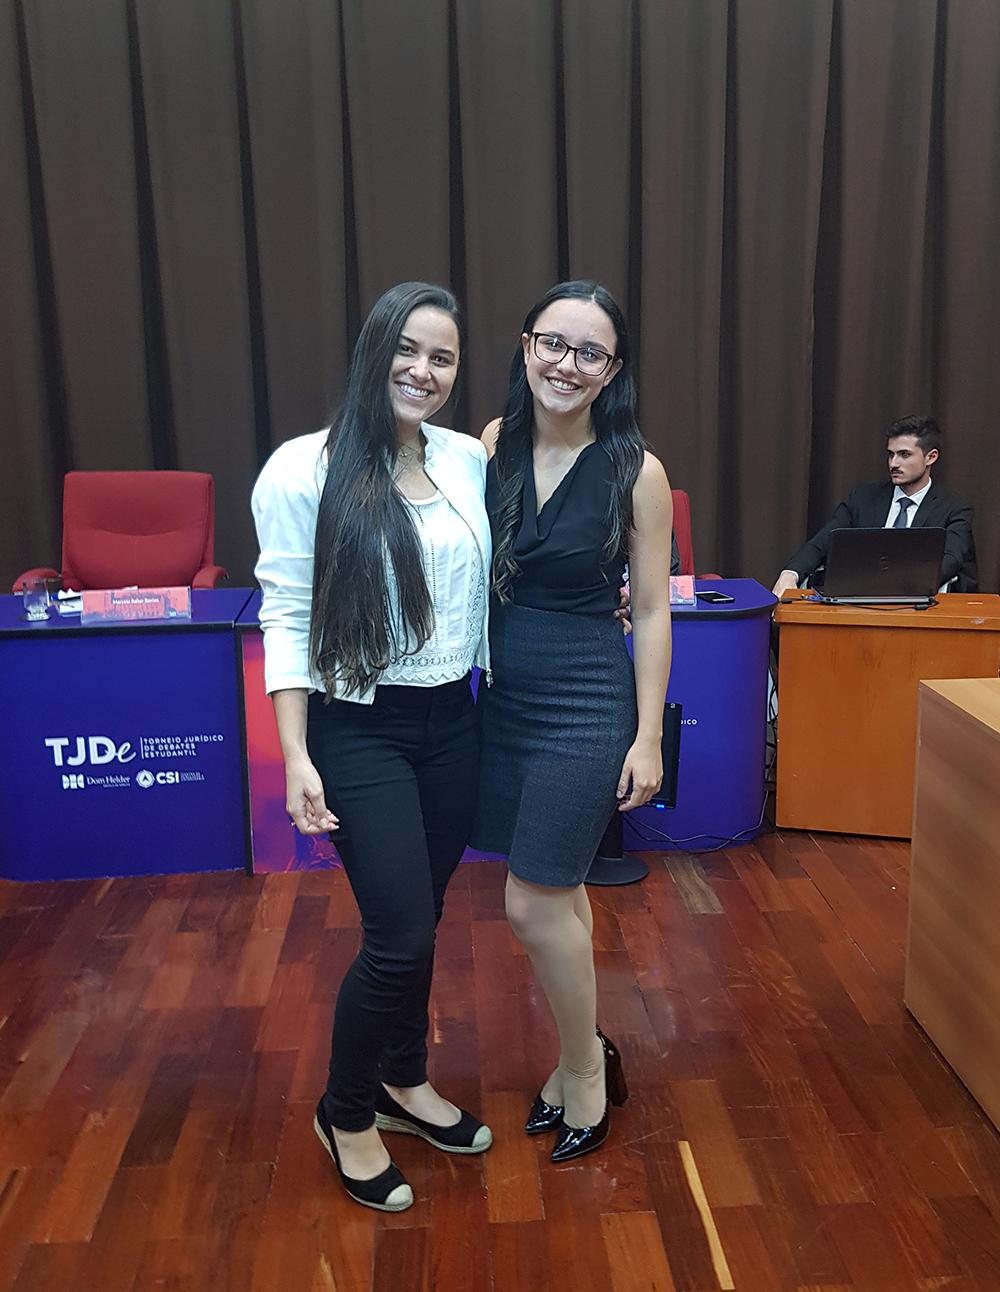 Dupla finalista do Torneio Jurídico de Debates Estudantil.